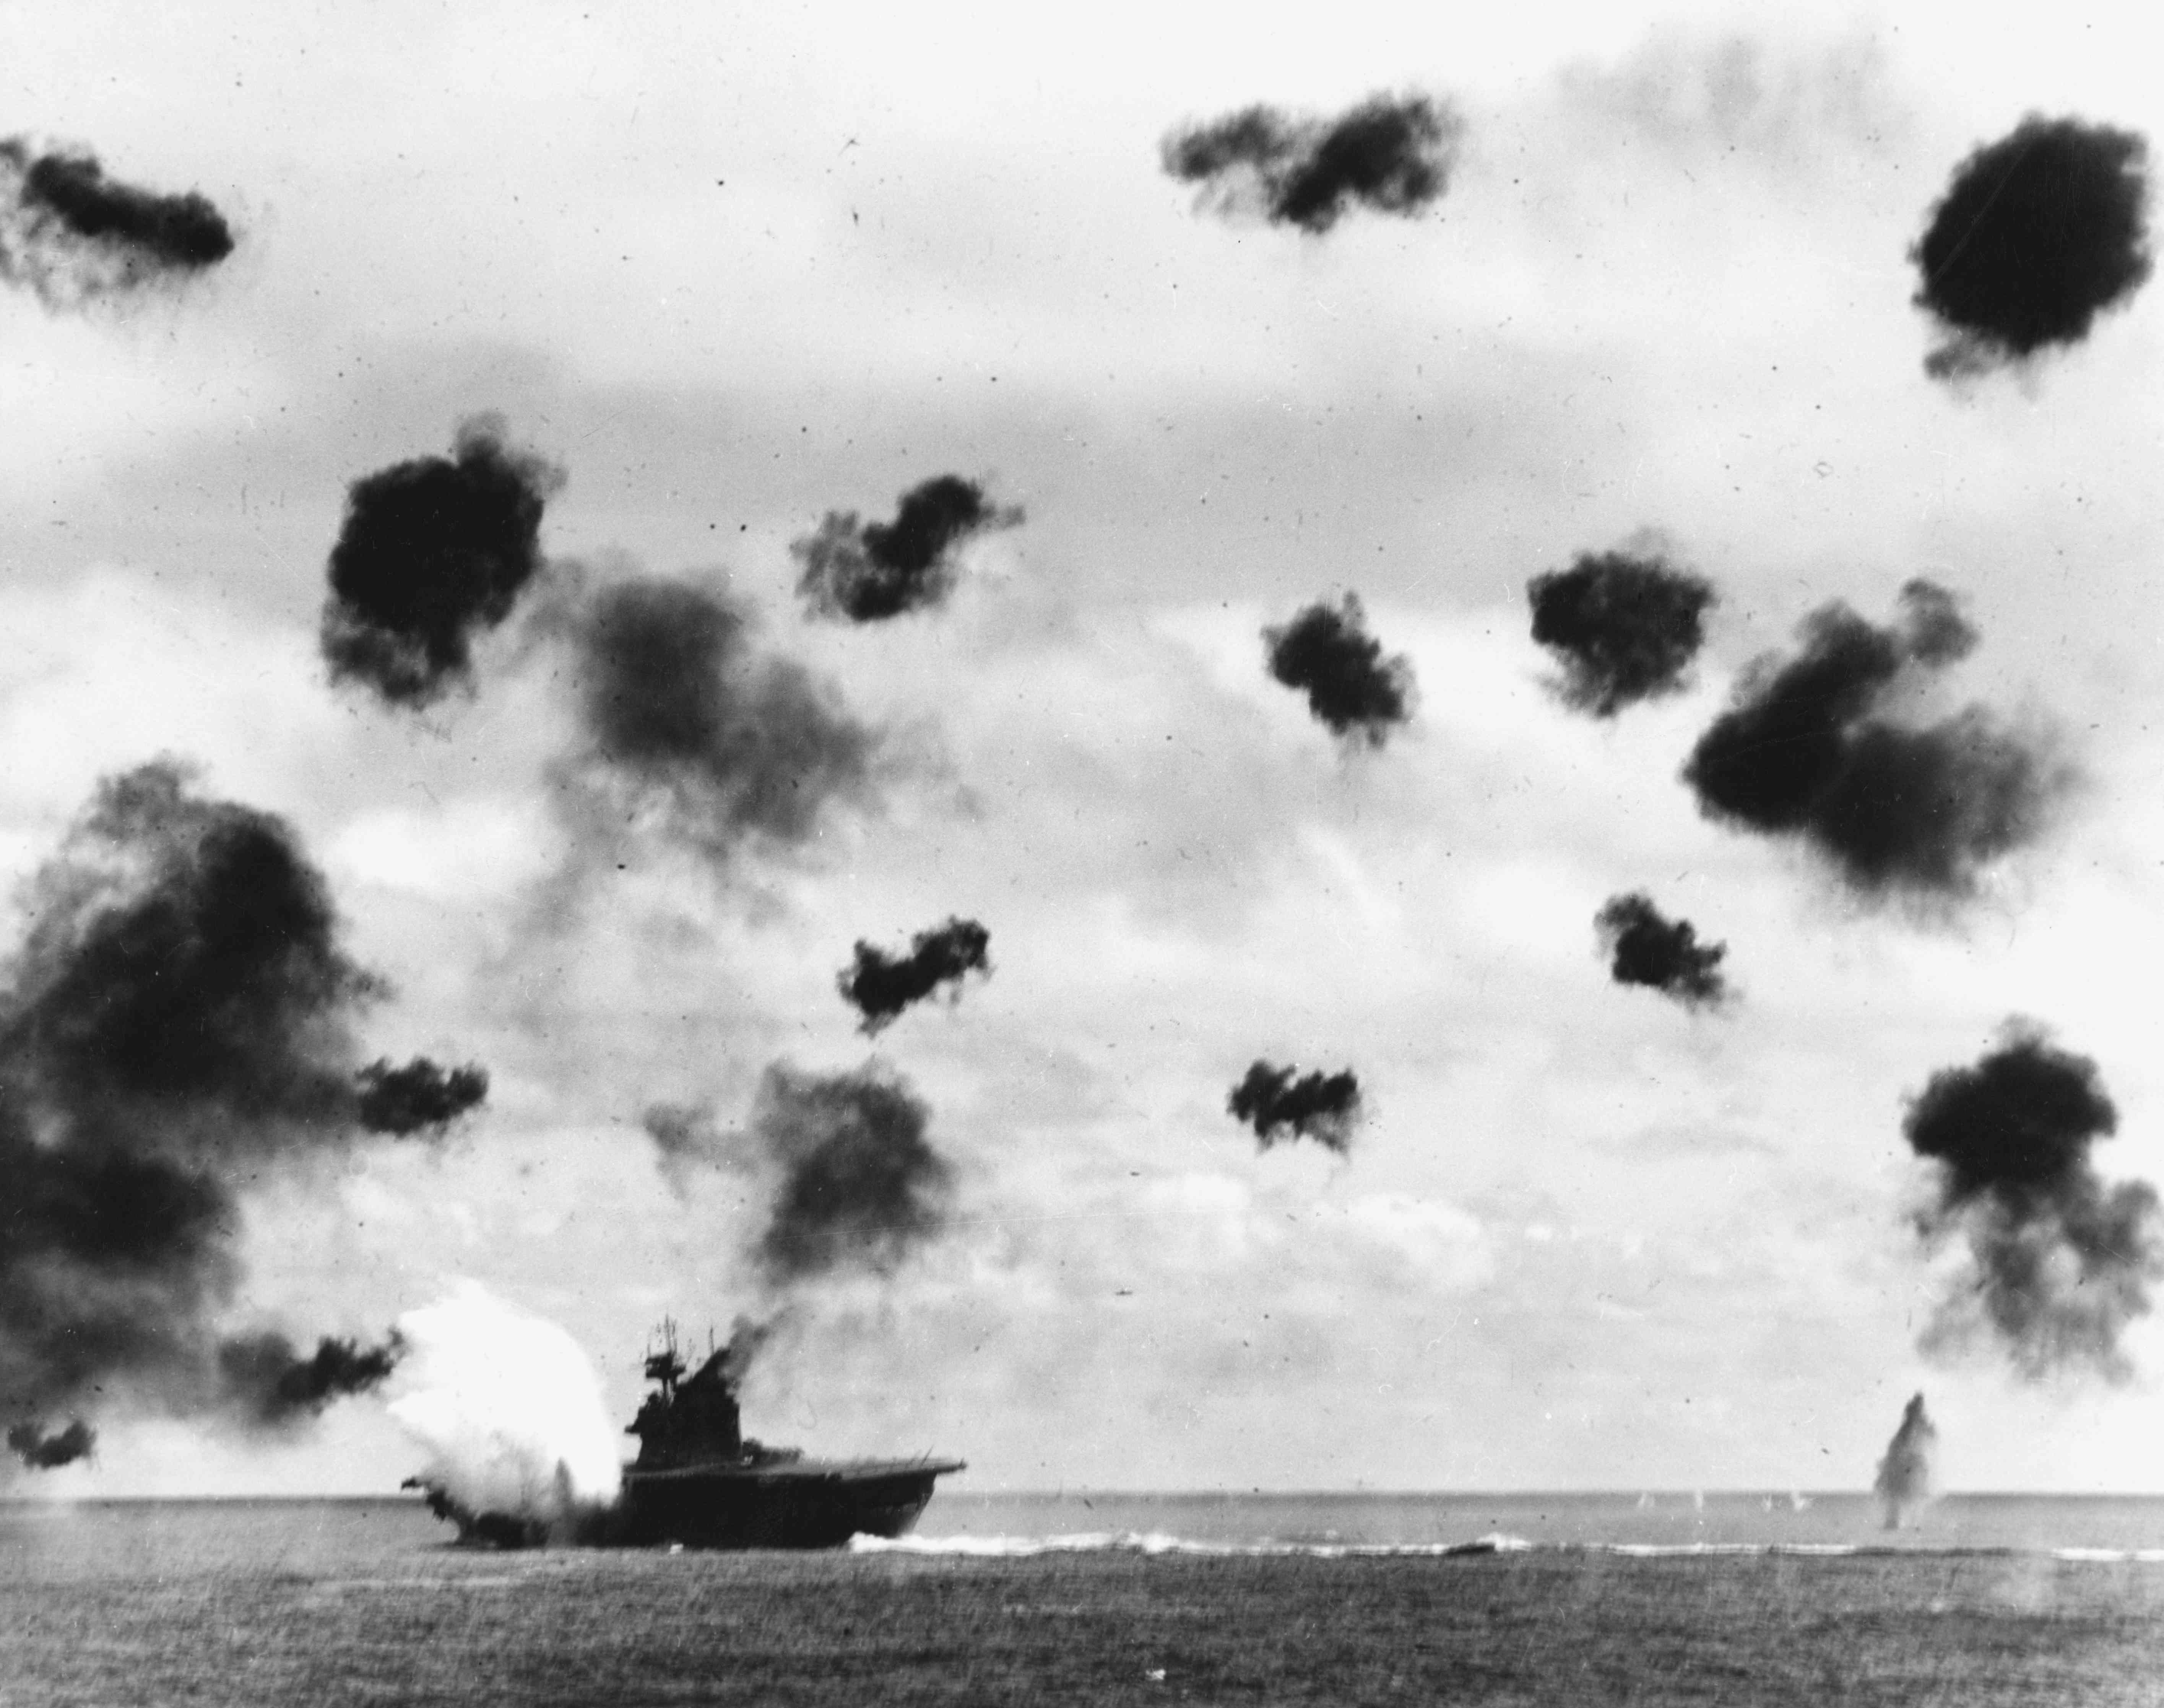 USS Yorktown (CV-5) at Midway